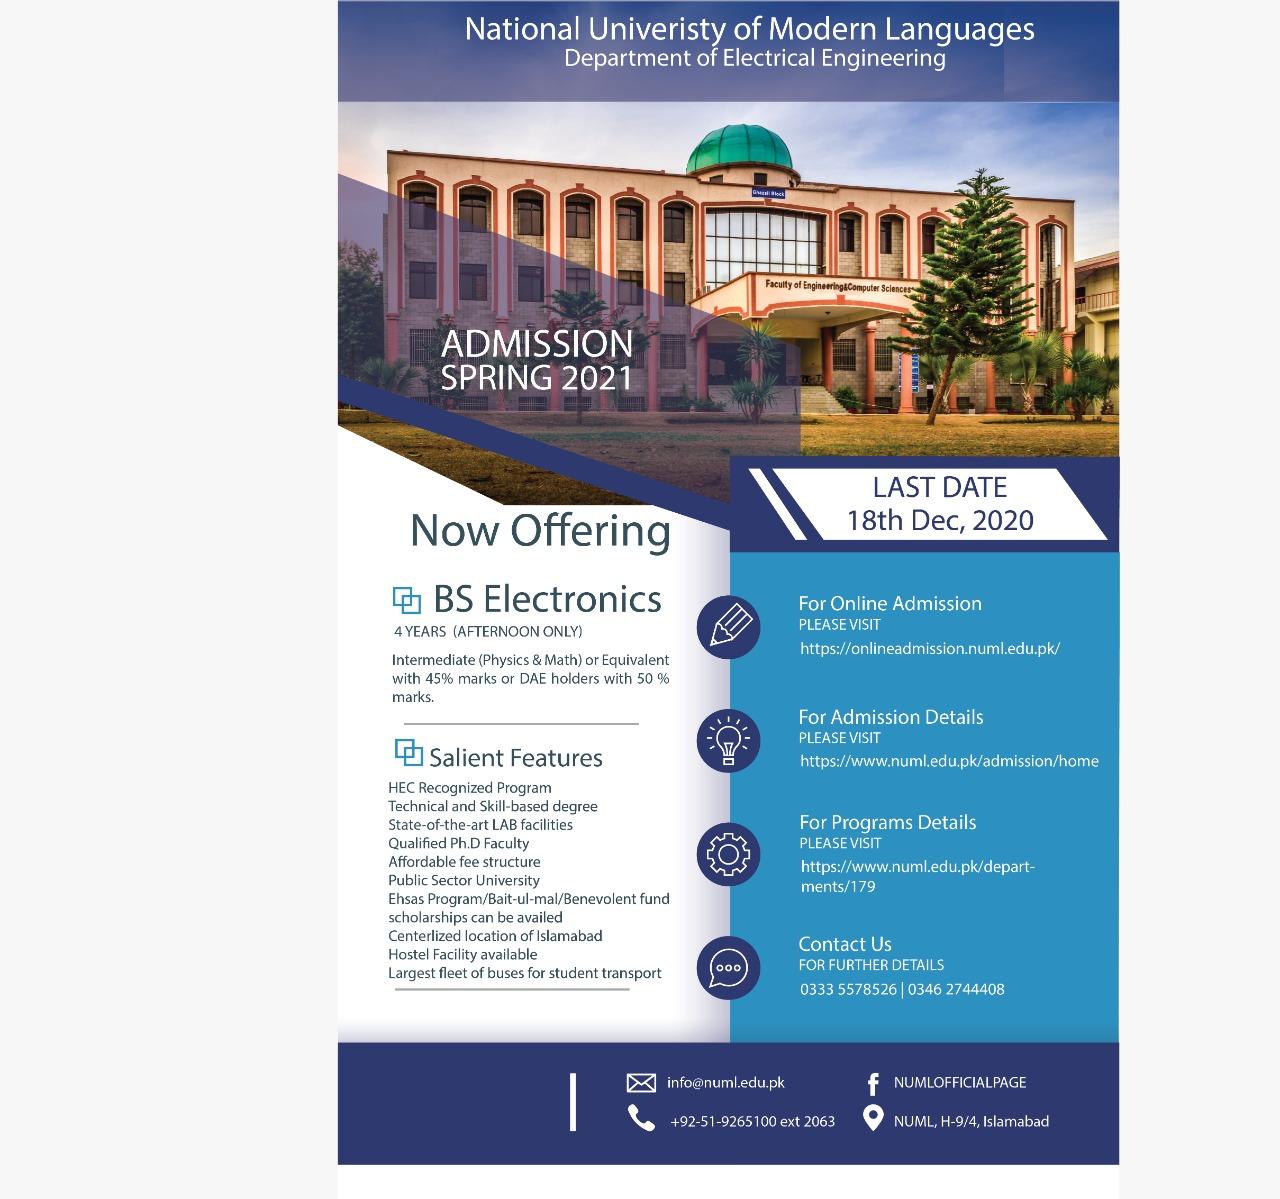 Admission Spring 2021 BS Electronics Program